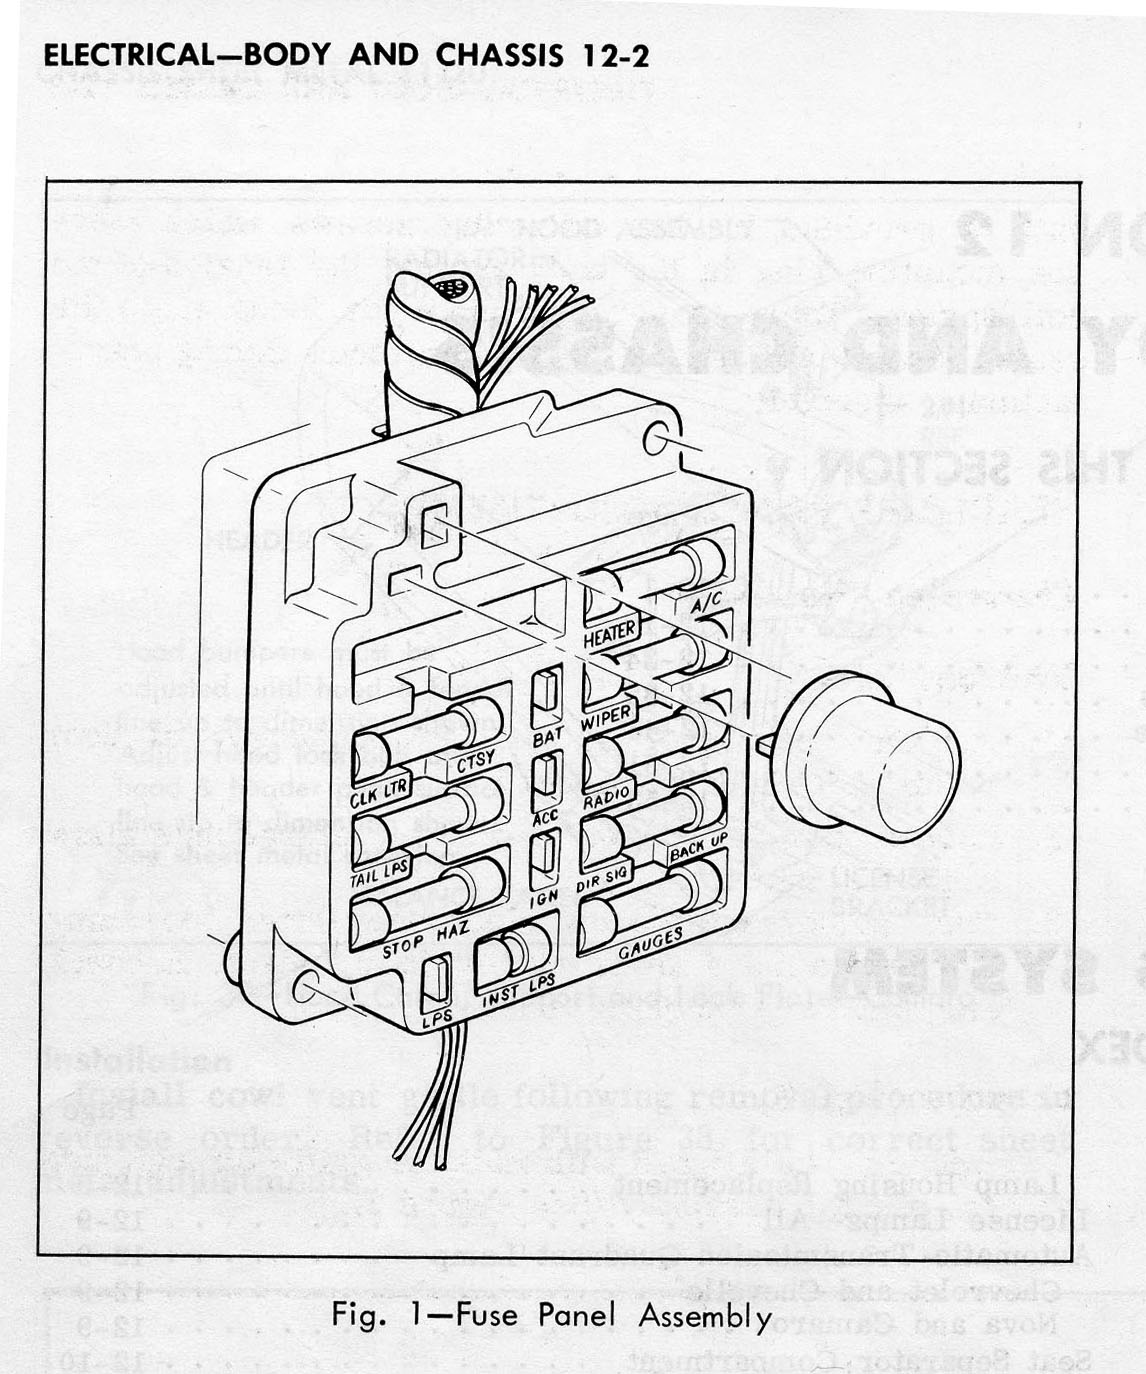 ZN_0741] 67 Camaro Fuse Box Housing Wiring DiagramGreas Knie Elec Mohammedshrine Librar Wiring 101